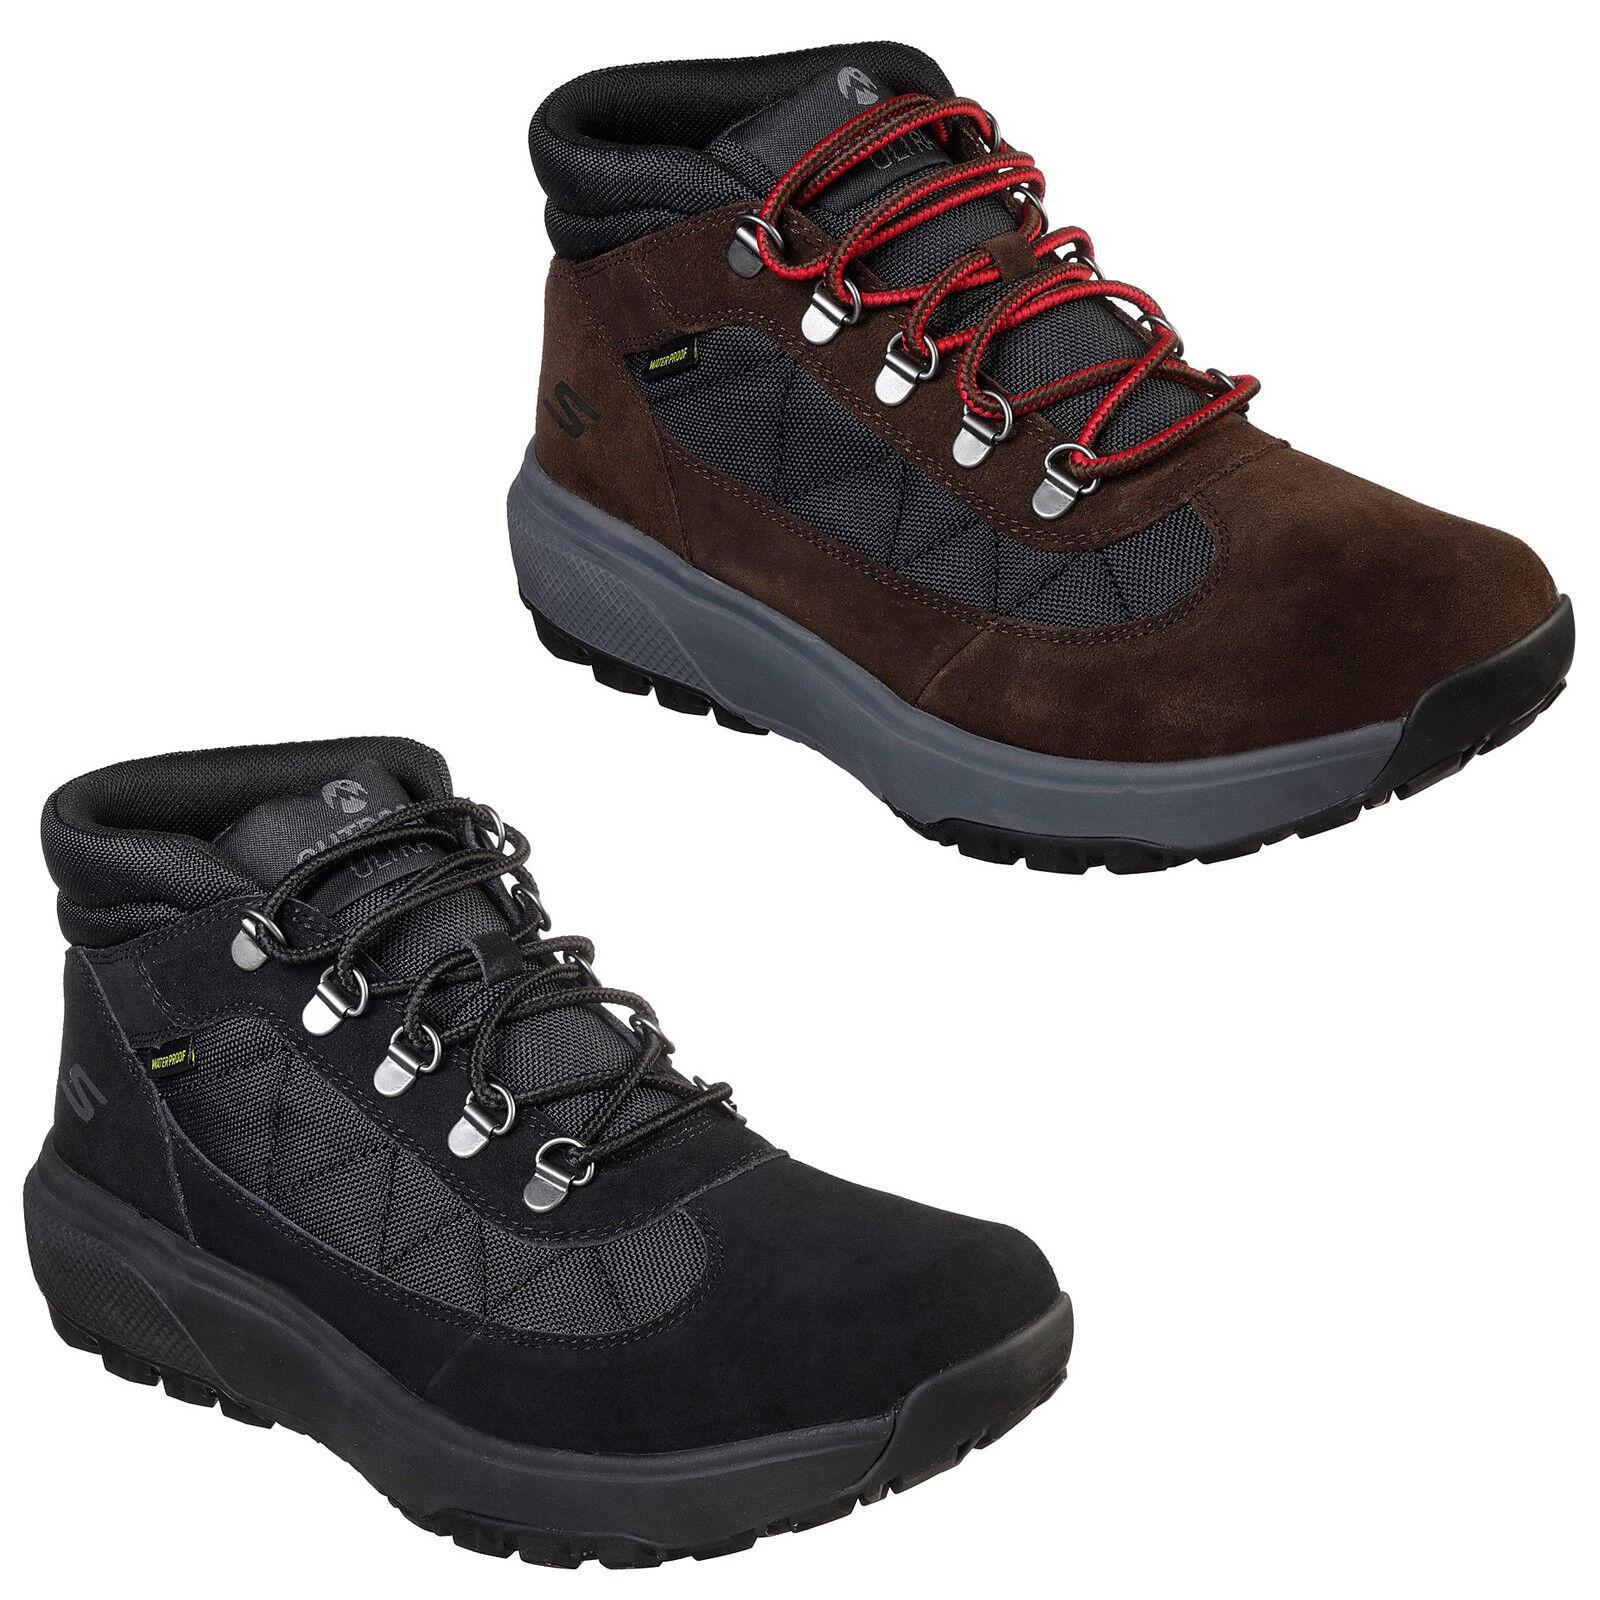 Skechers Go Outdoors Ultra - Adventures Schuhes 55487  Herren Trail Walking Stiefel